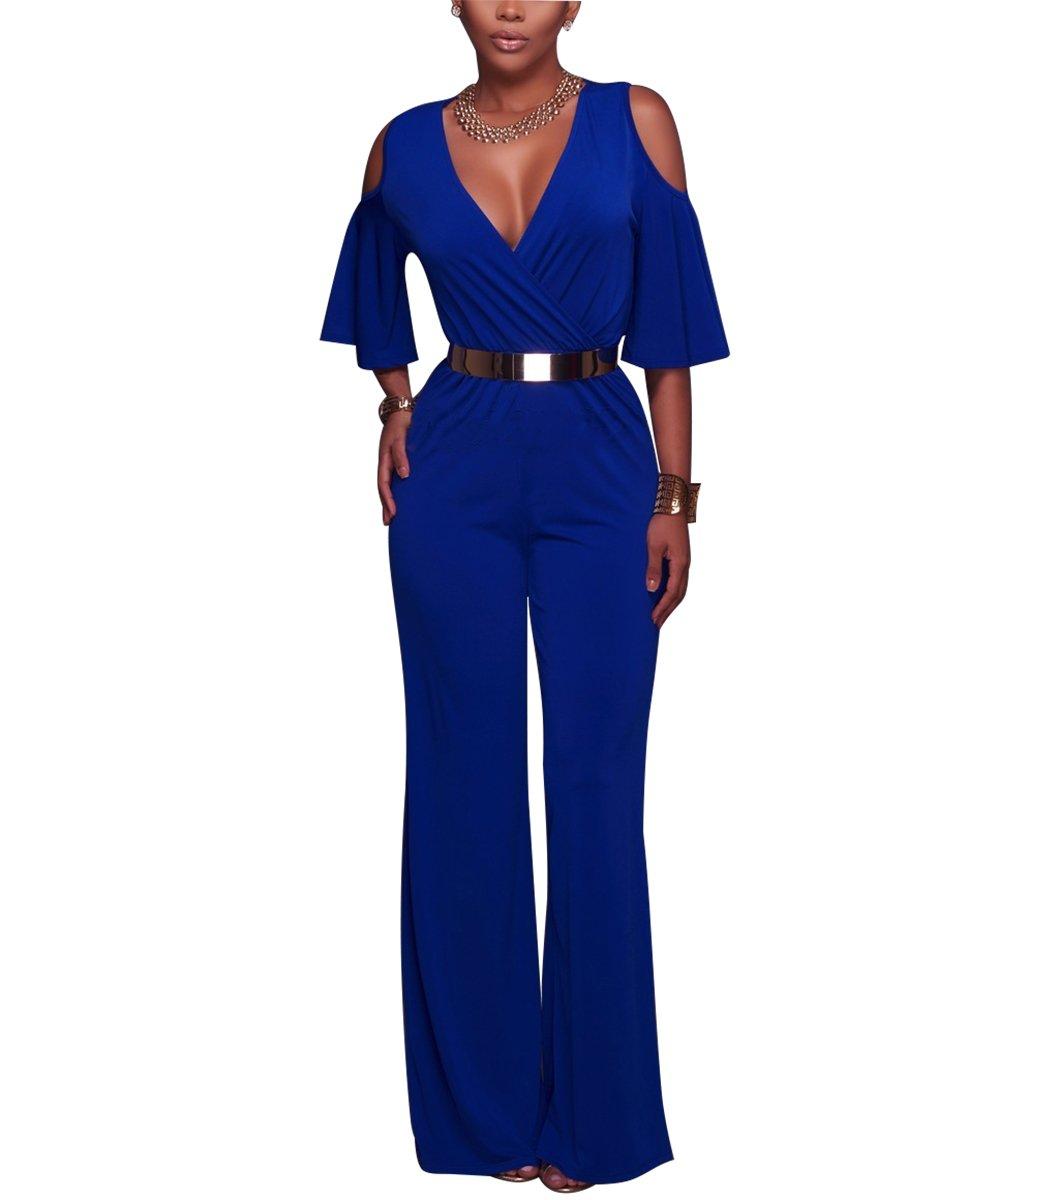 Vilover Women's Cold Shoulder Loose Wide Leg Jumpsuits Rompers With Belt (XL, Blue)